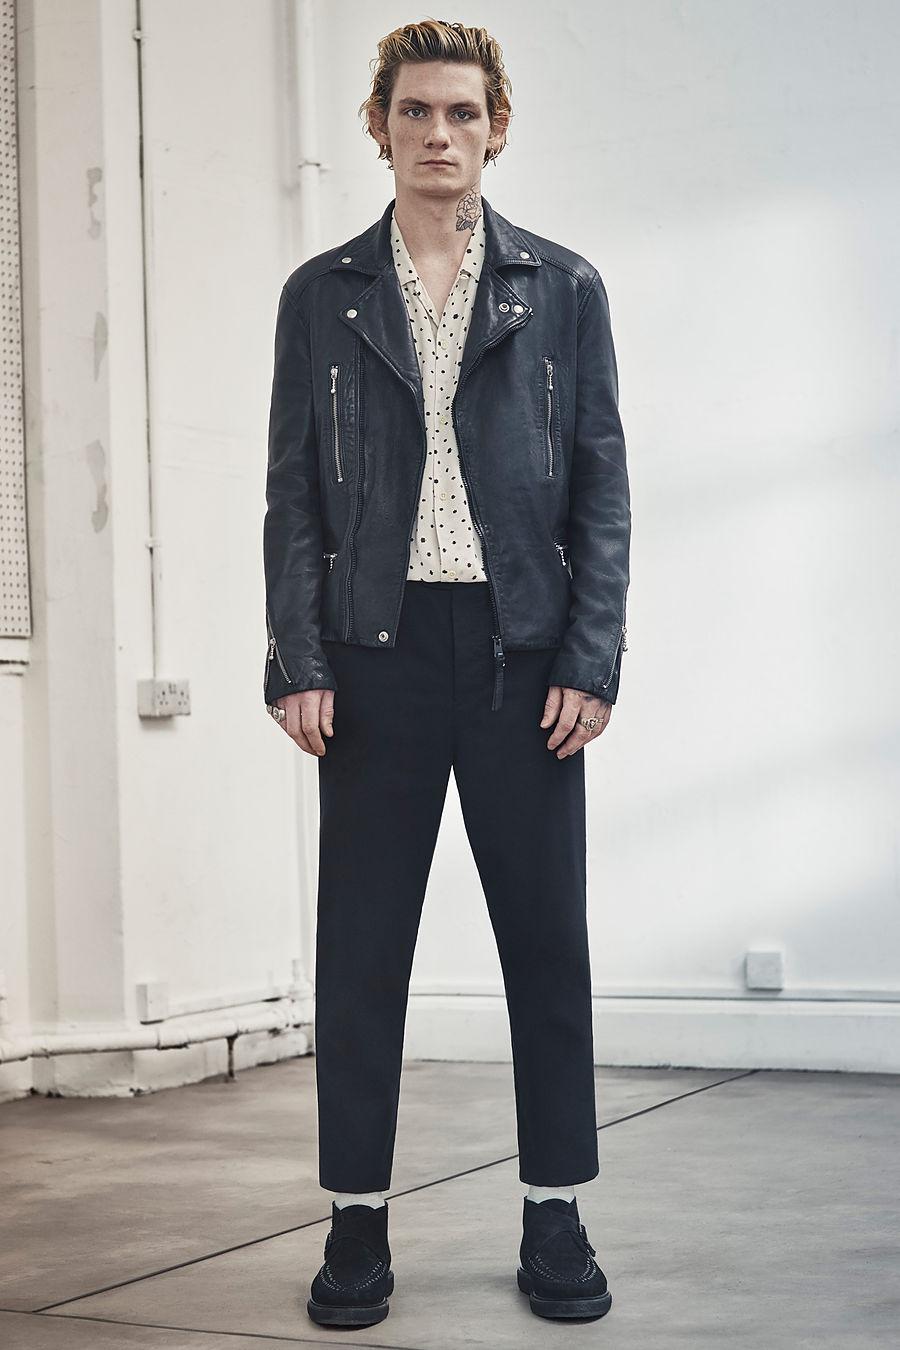 Yuma short-sleeve shirt, £80 Pico trouser, £128 Bower Boot, £158